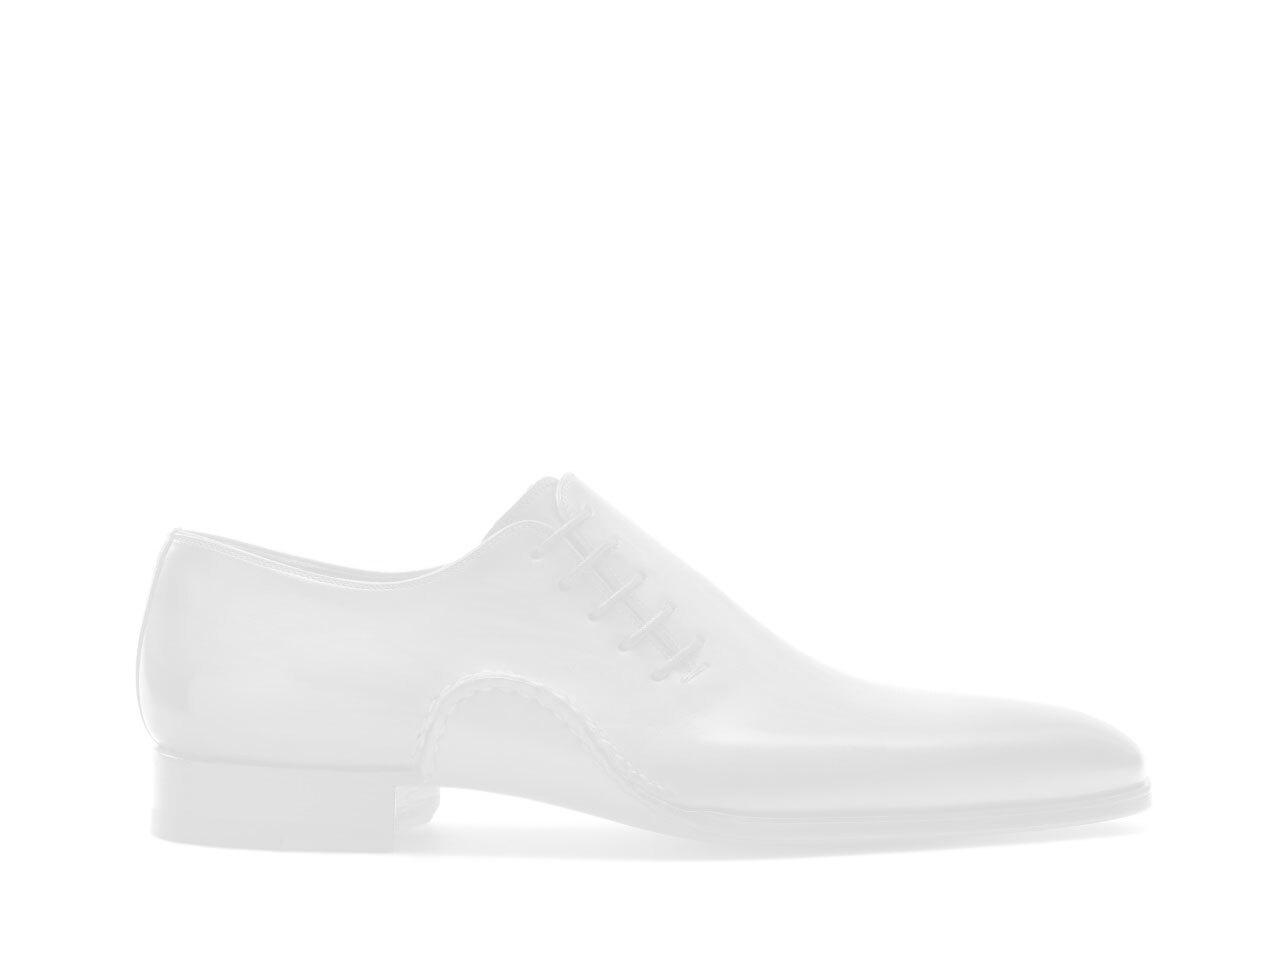 Pair of the Magnanni Cruz Black Men's Oxford Shoes